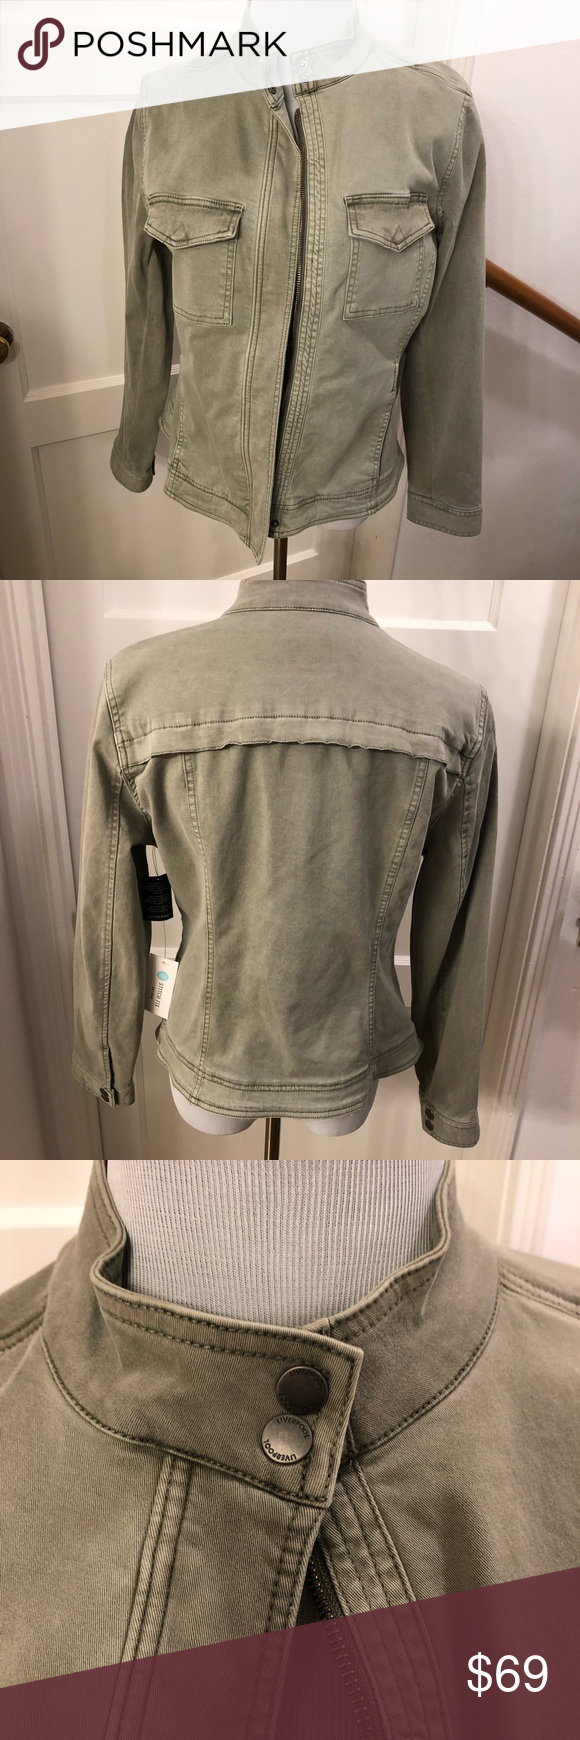 Nwt Liverpool Harper Denim Jacket M Green Denim Jacket Liverpool Clothing Liverpool Jeans [ 1740 x 580 Pixel ]